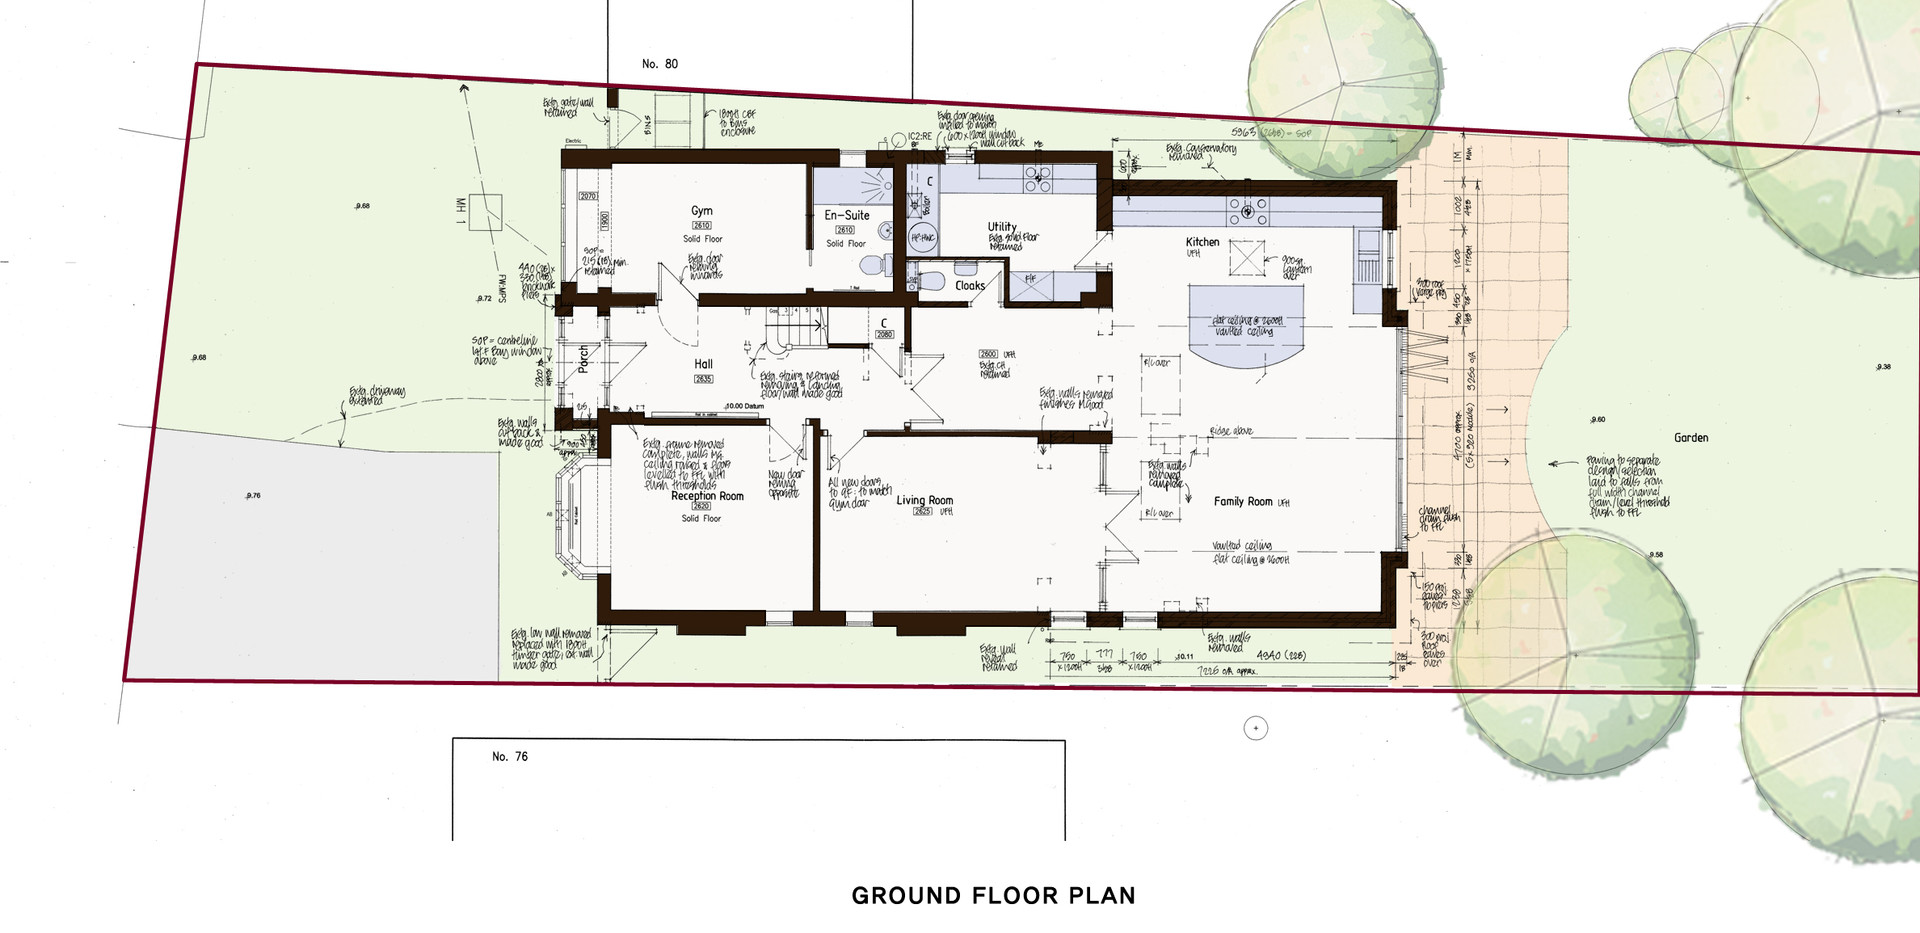 03 Ground floor plan.JPG